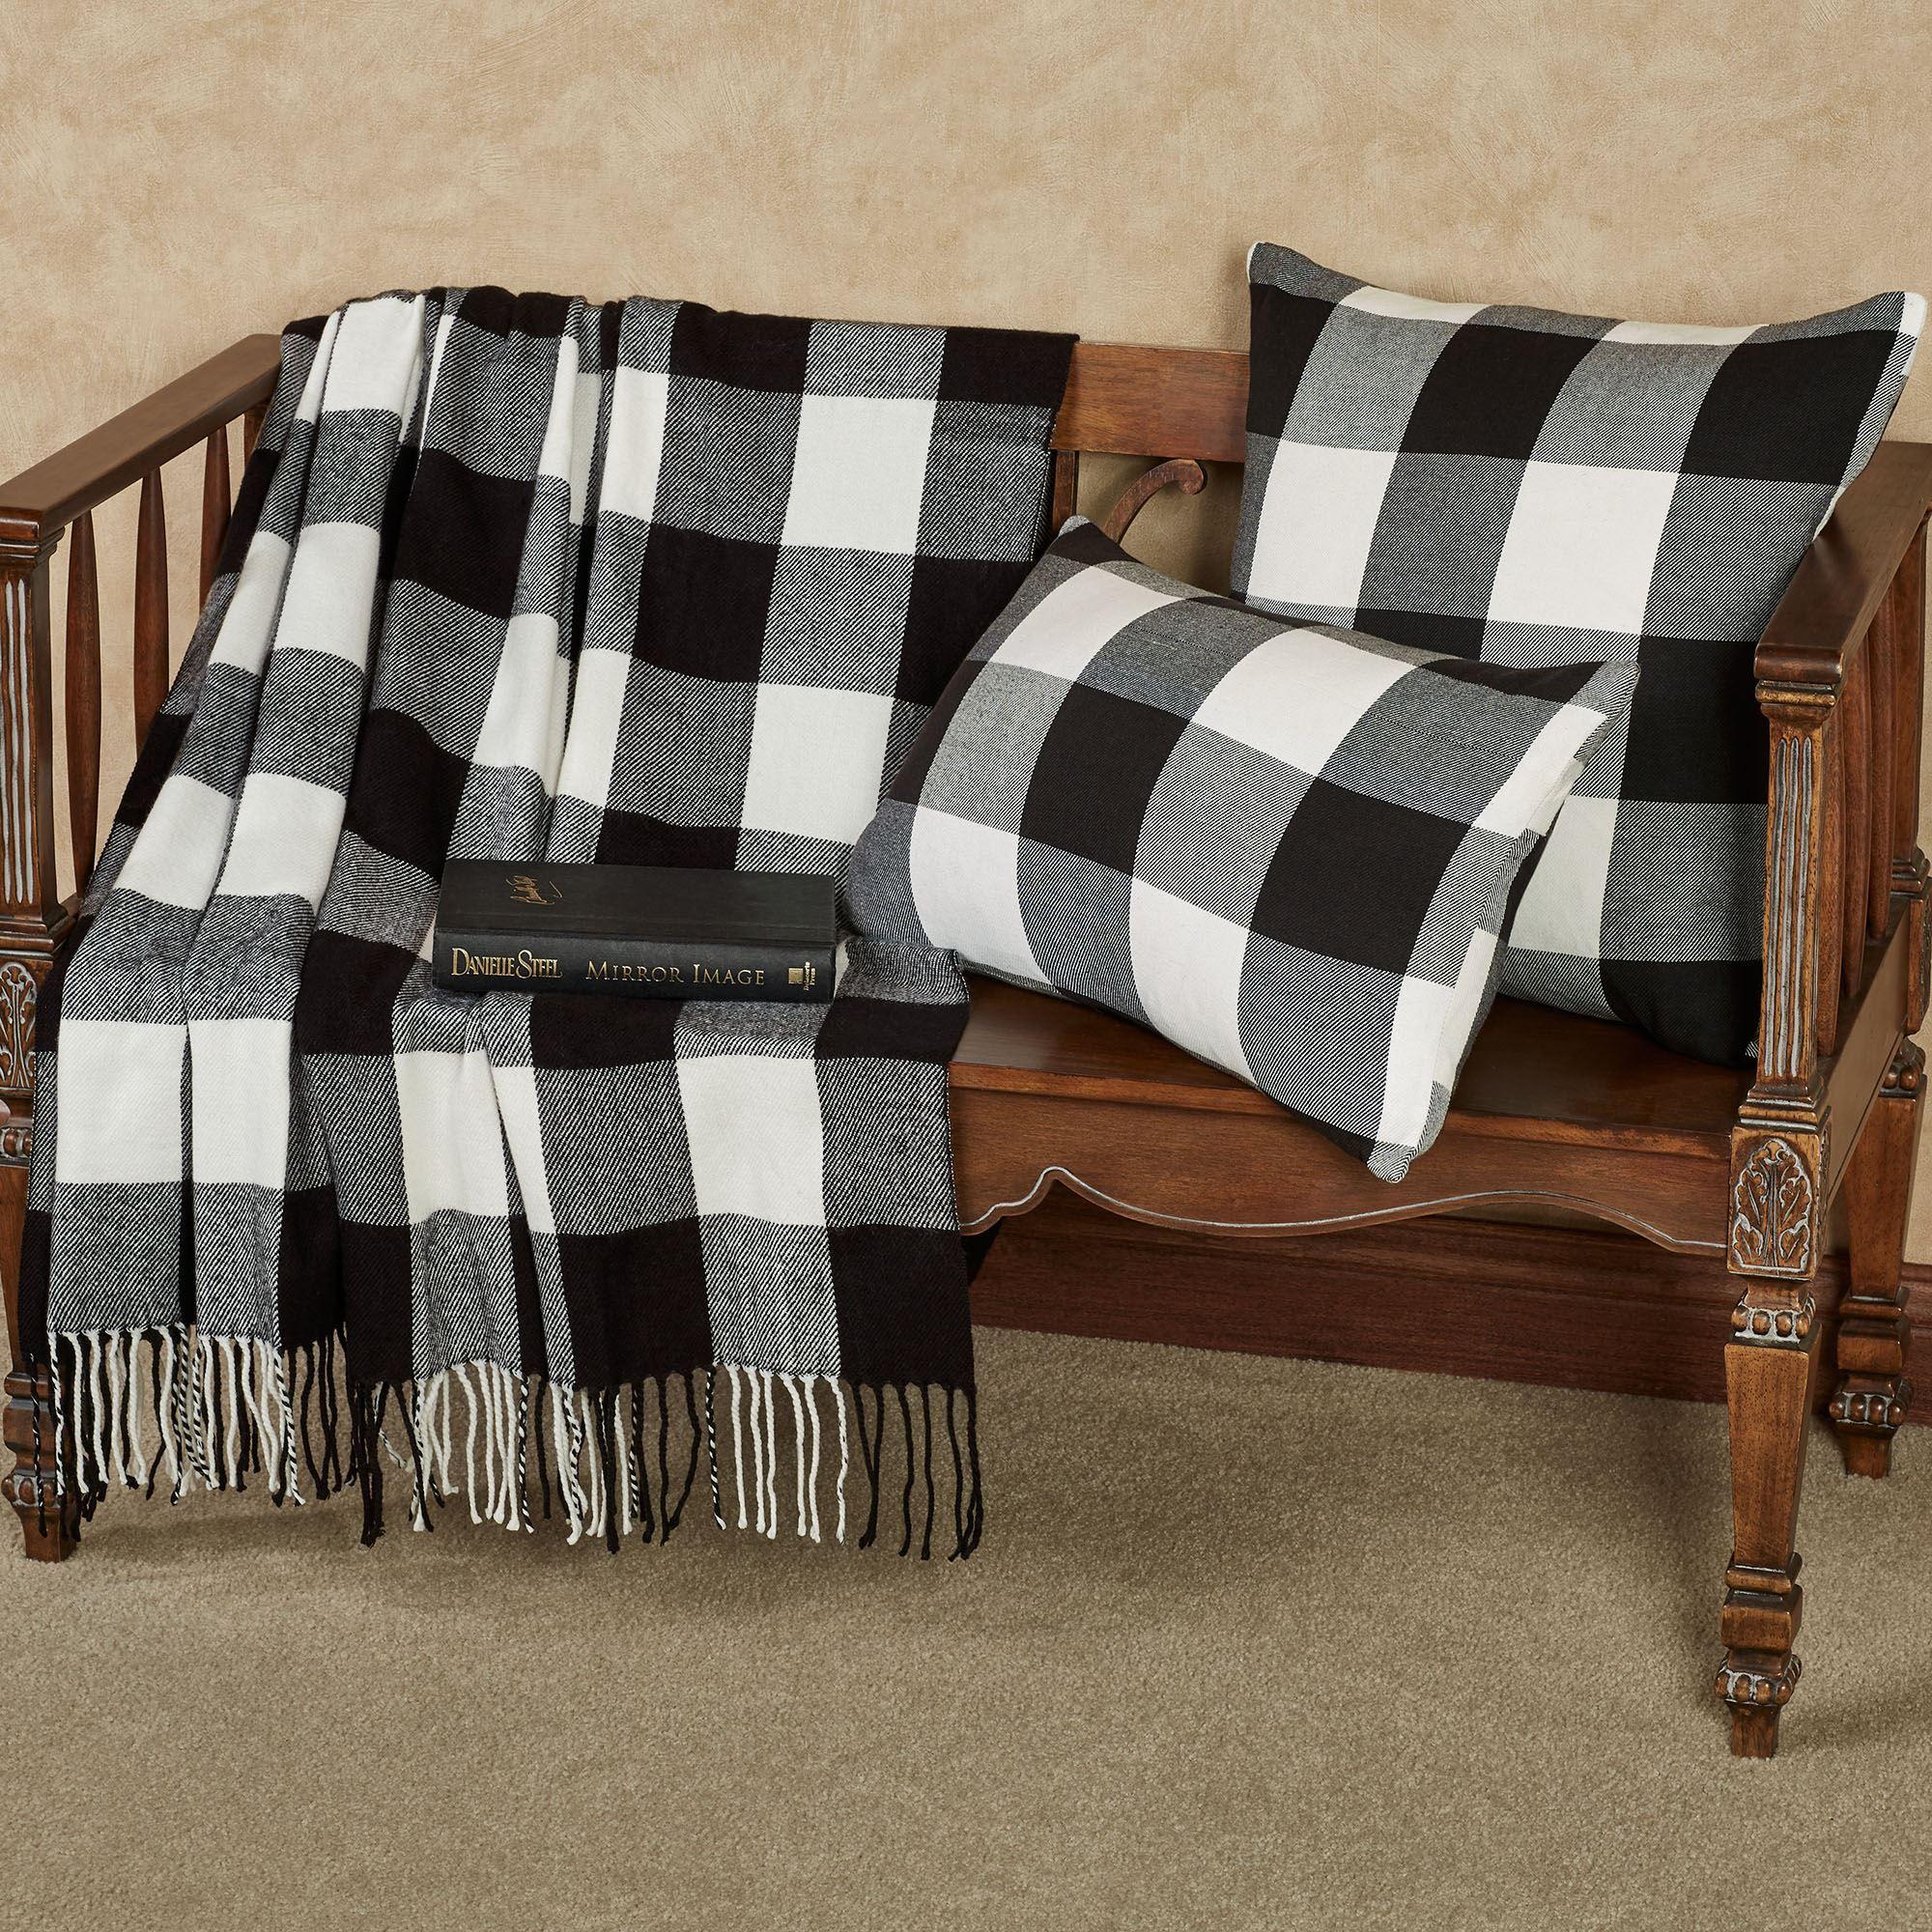 Wondrous Rustic Buffalo Plaid Black And White Throw Blanket Or Pillows Creativecarmelina Interior Chair Design Creativecarmelinacom